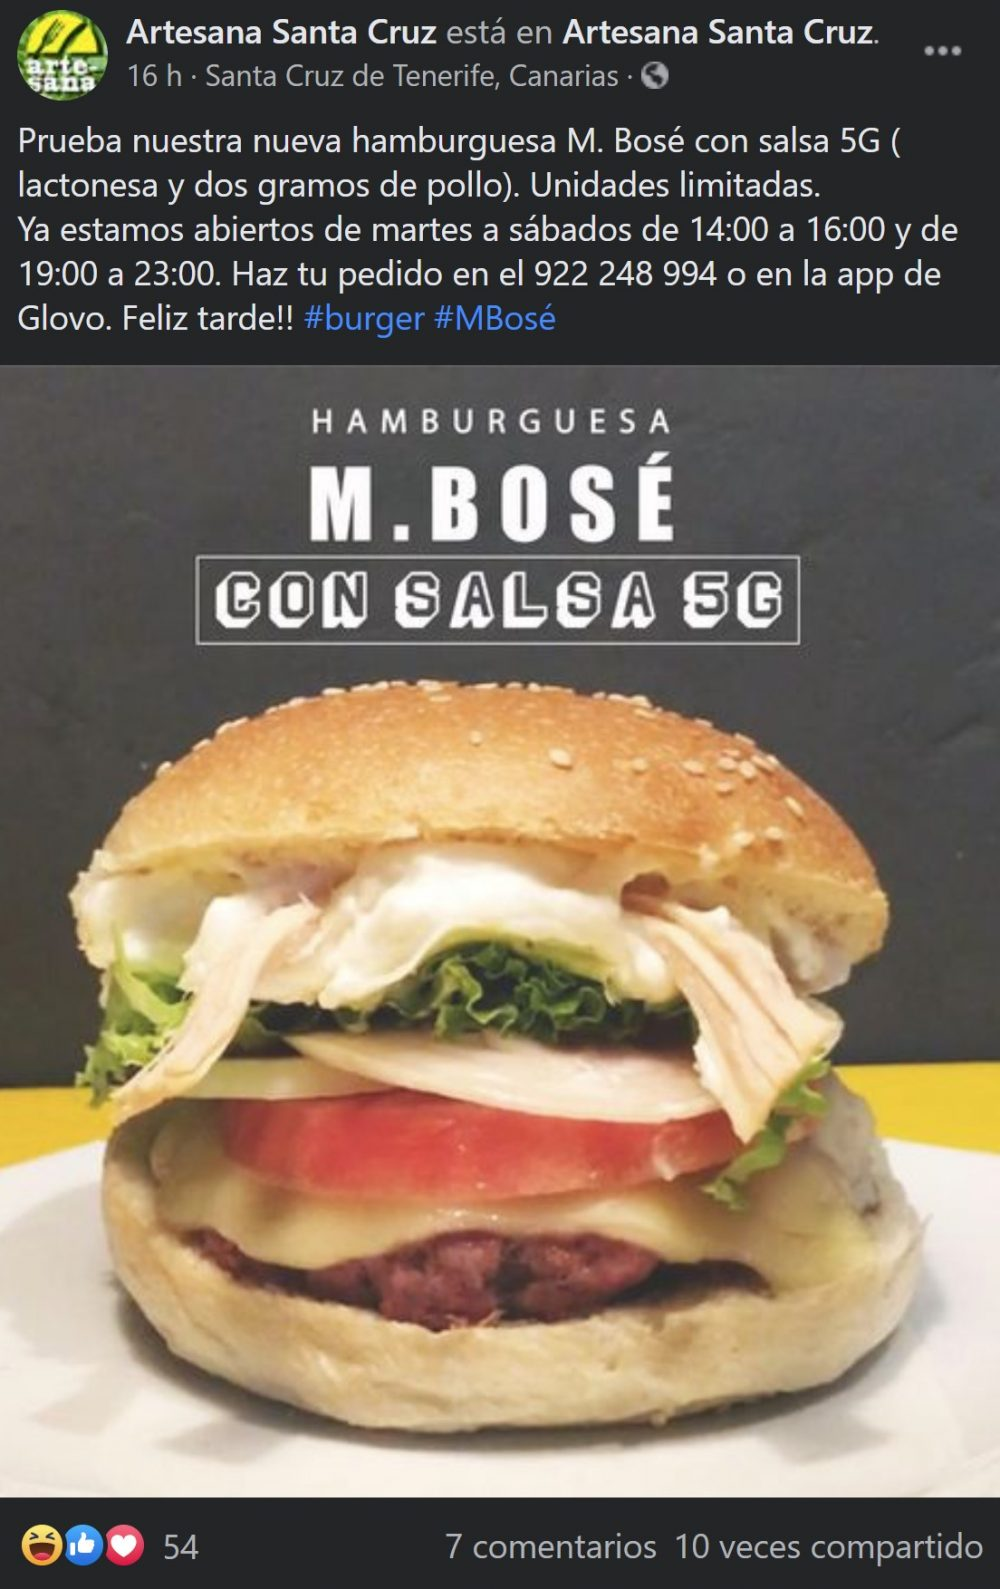 "M. Bosé: La hamburguesa con ""salsa 5G"" que podrás comer en Santa Cruz de Tenerife"